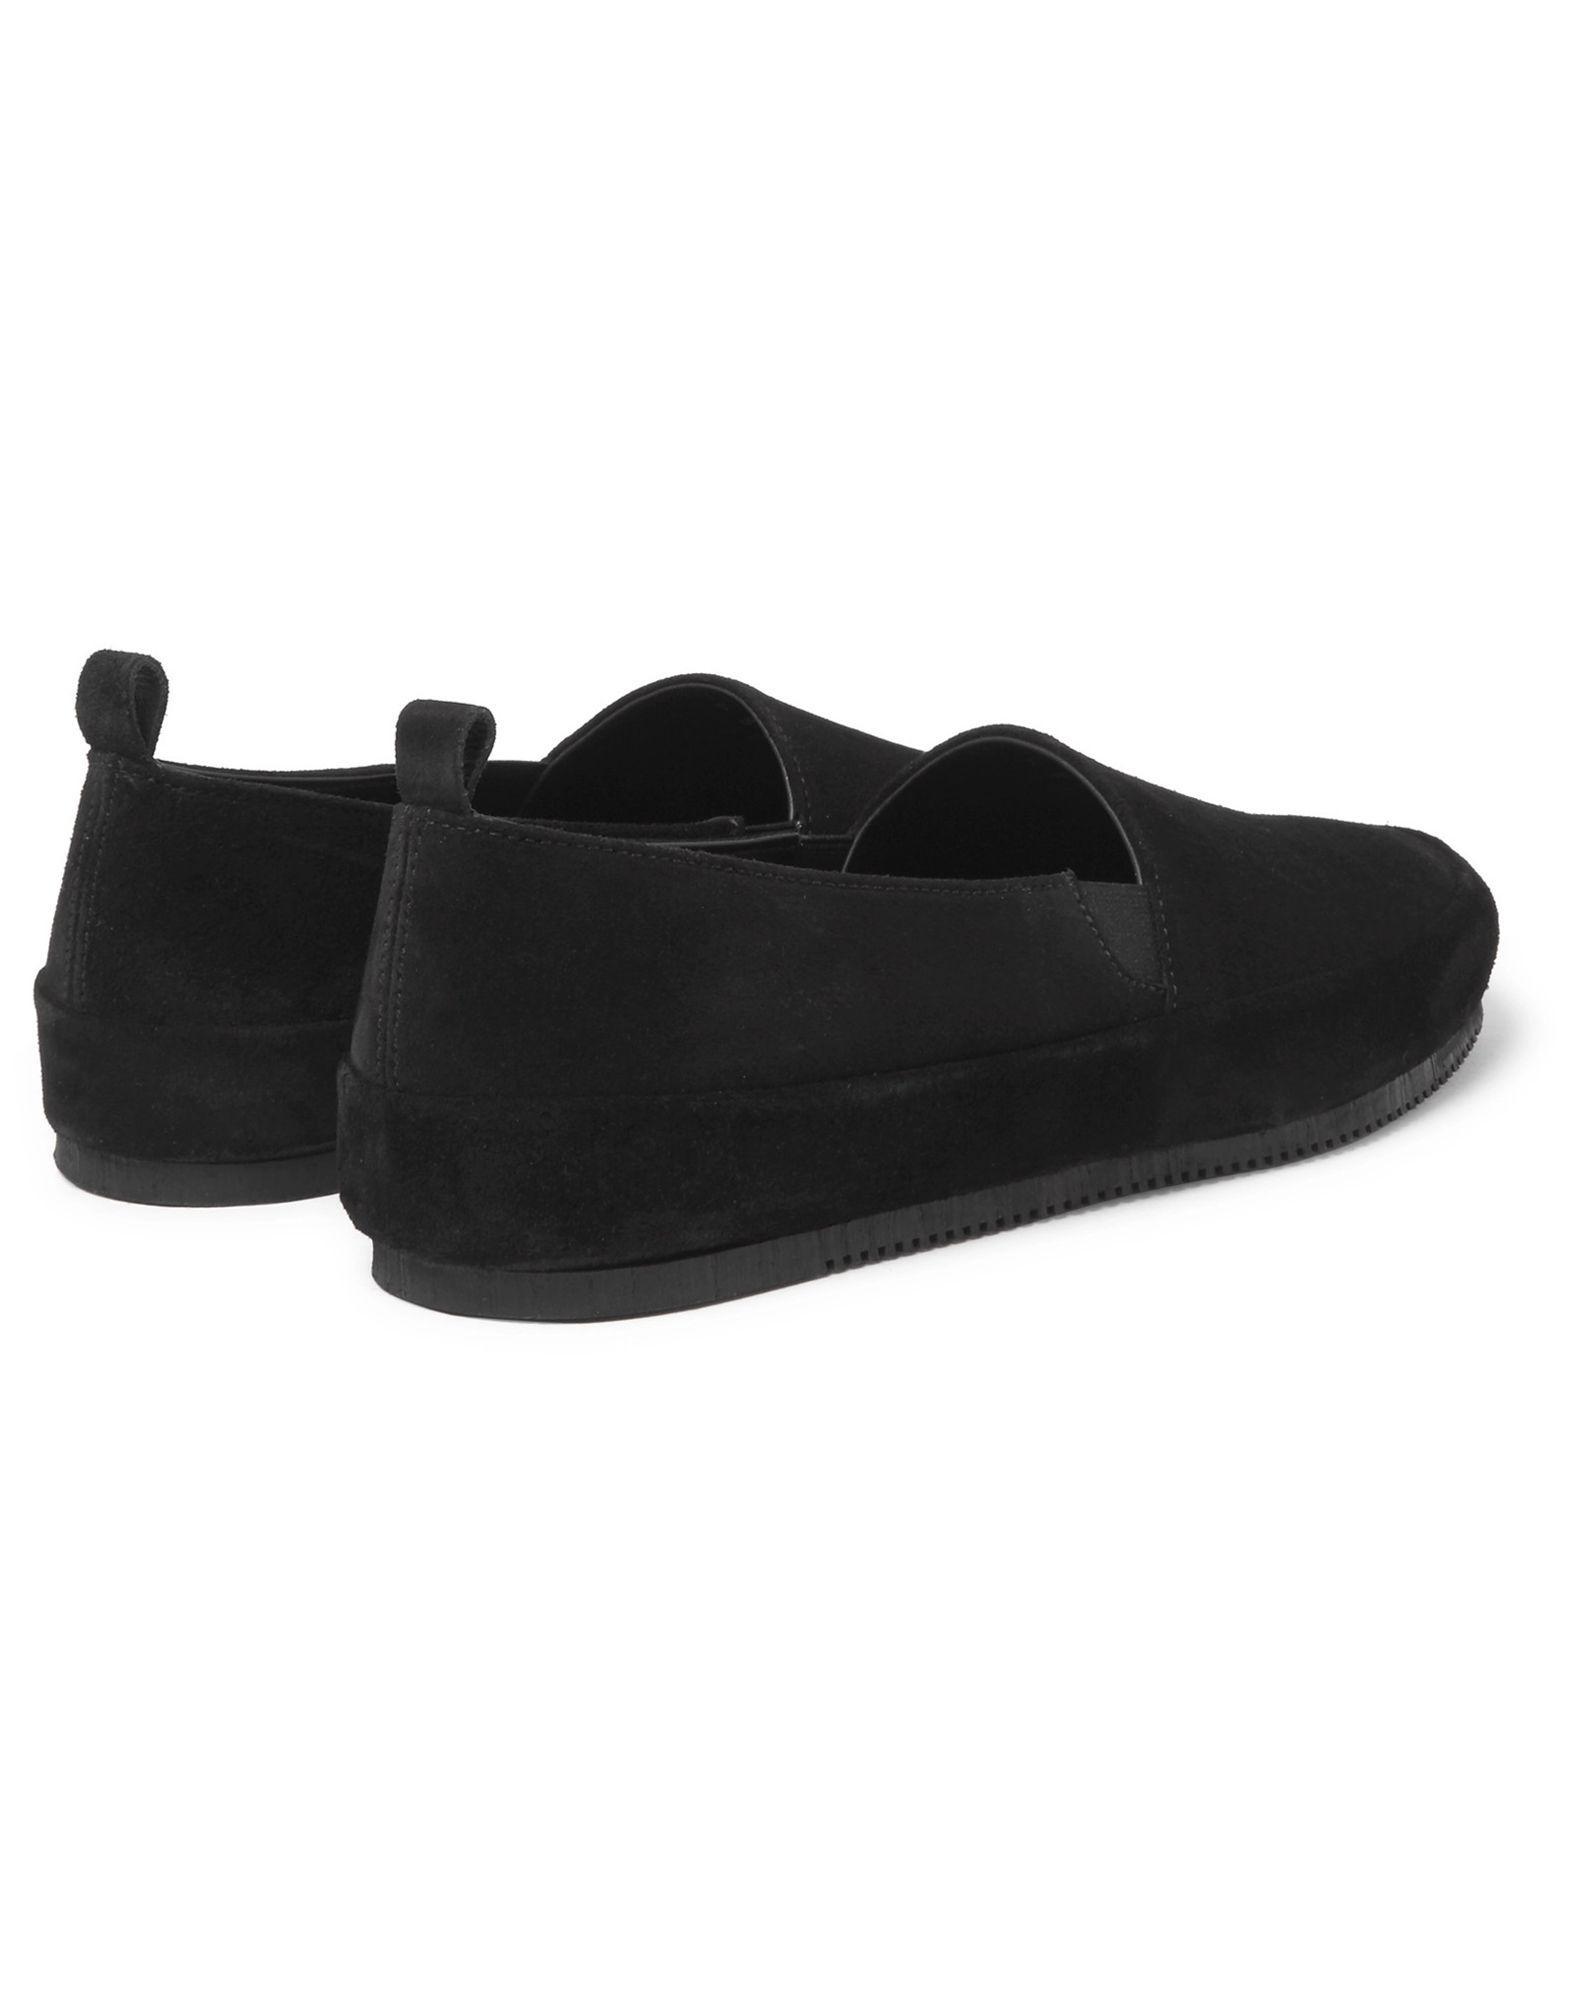 Mulo Leather Loafer in Black for Men